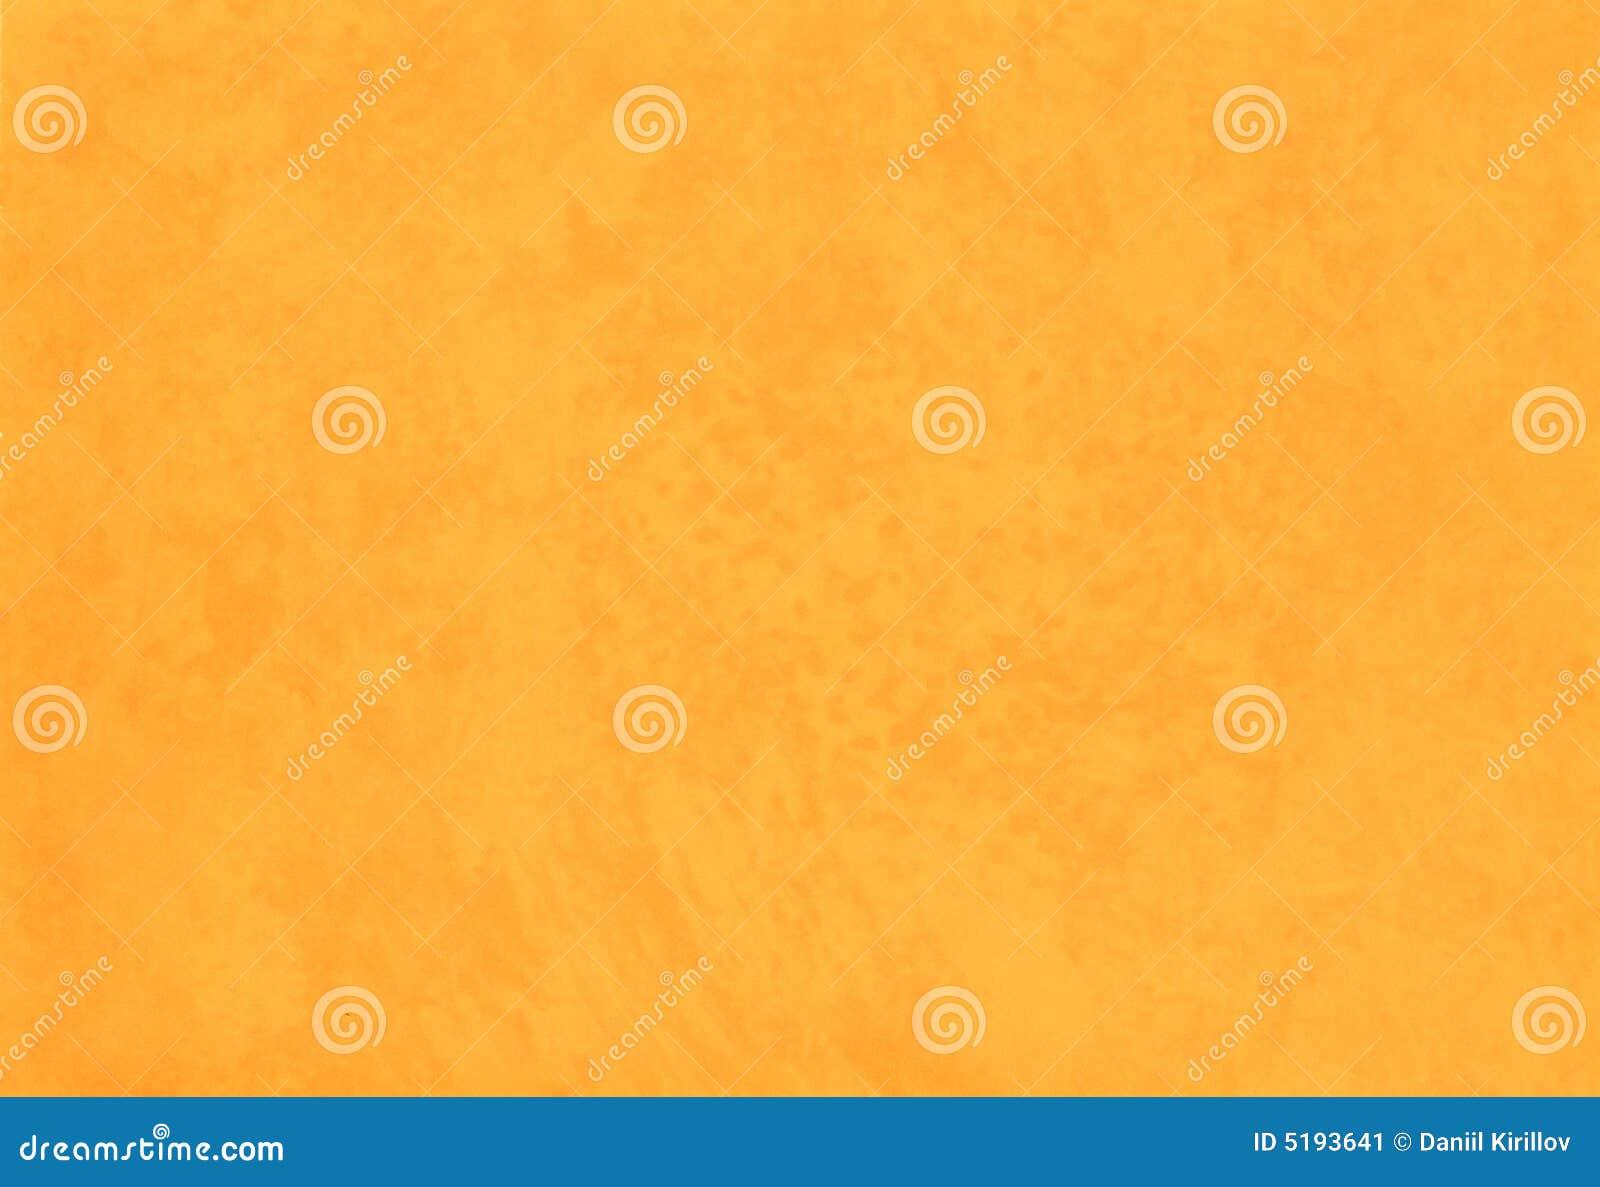 Stock Image  Terra yellow texture wallpaper design backgroundYellow Wallpaper Texture